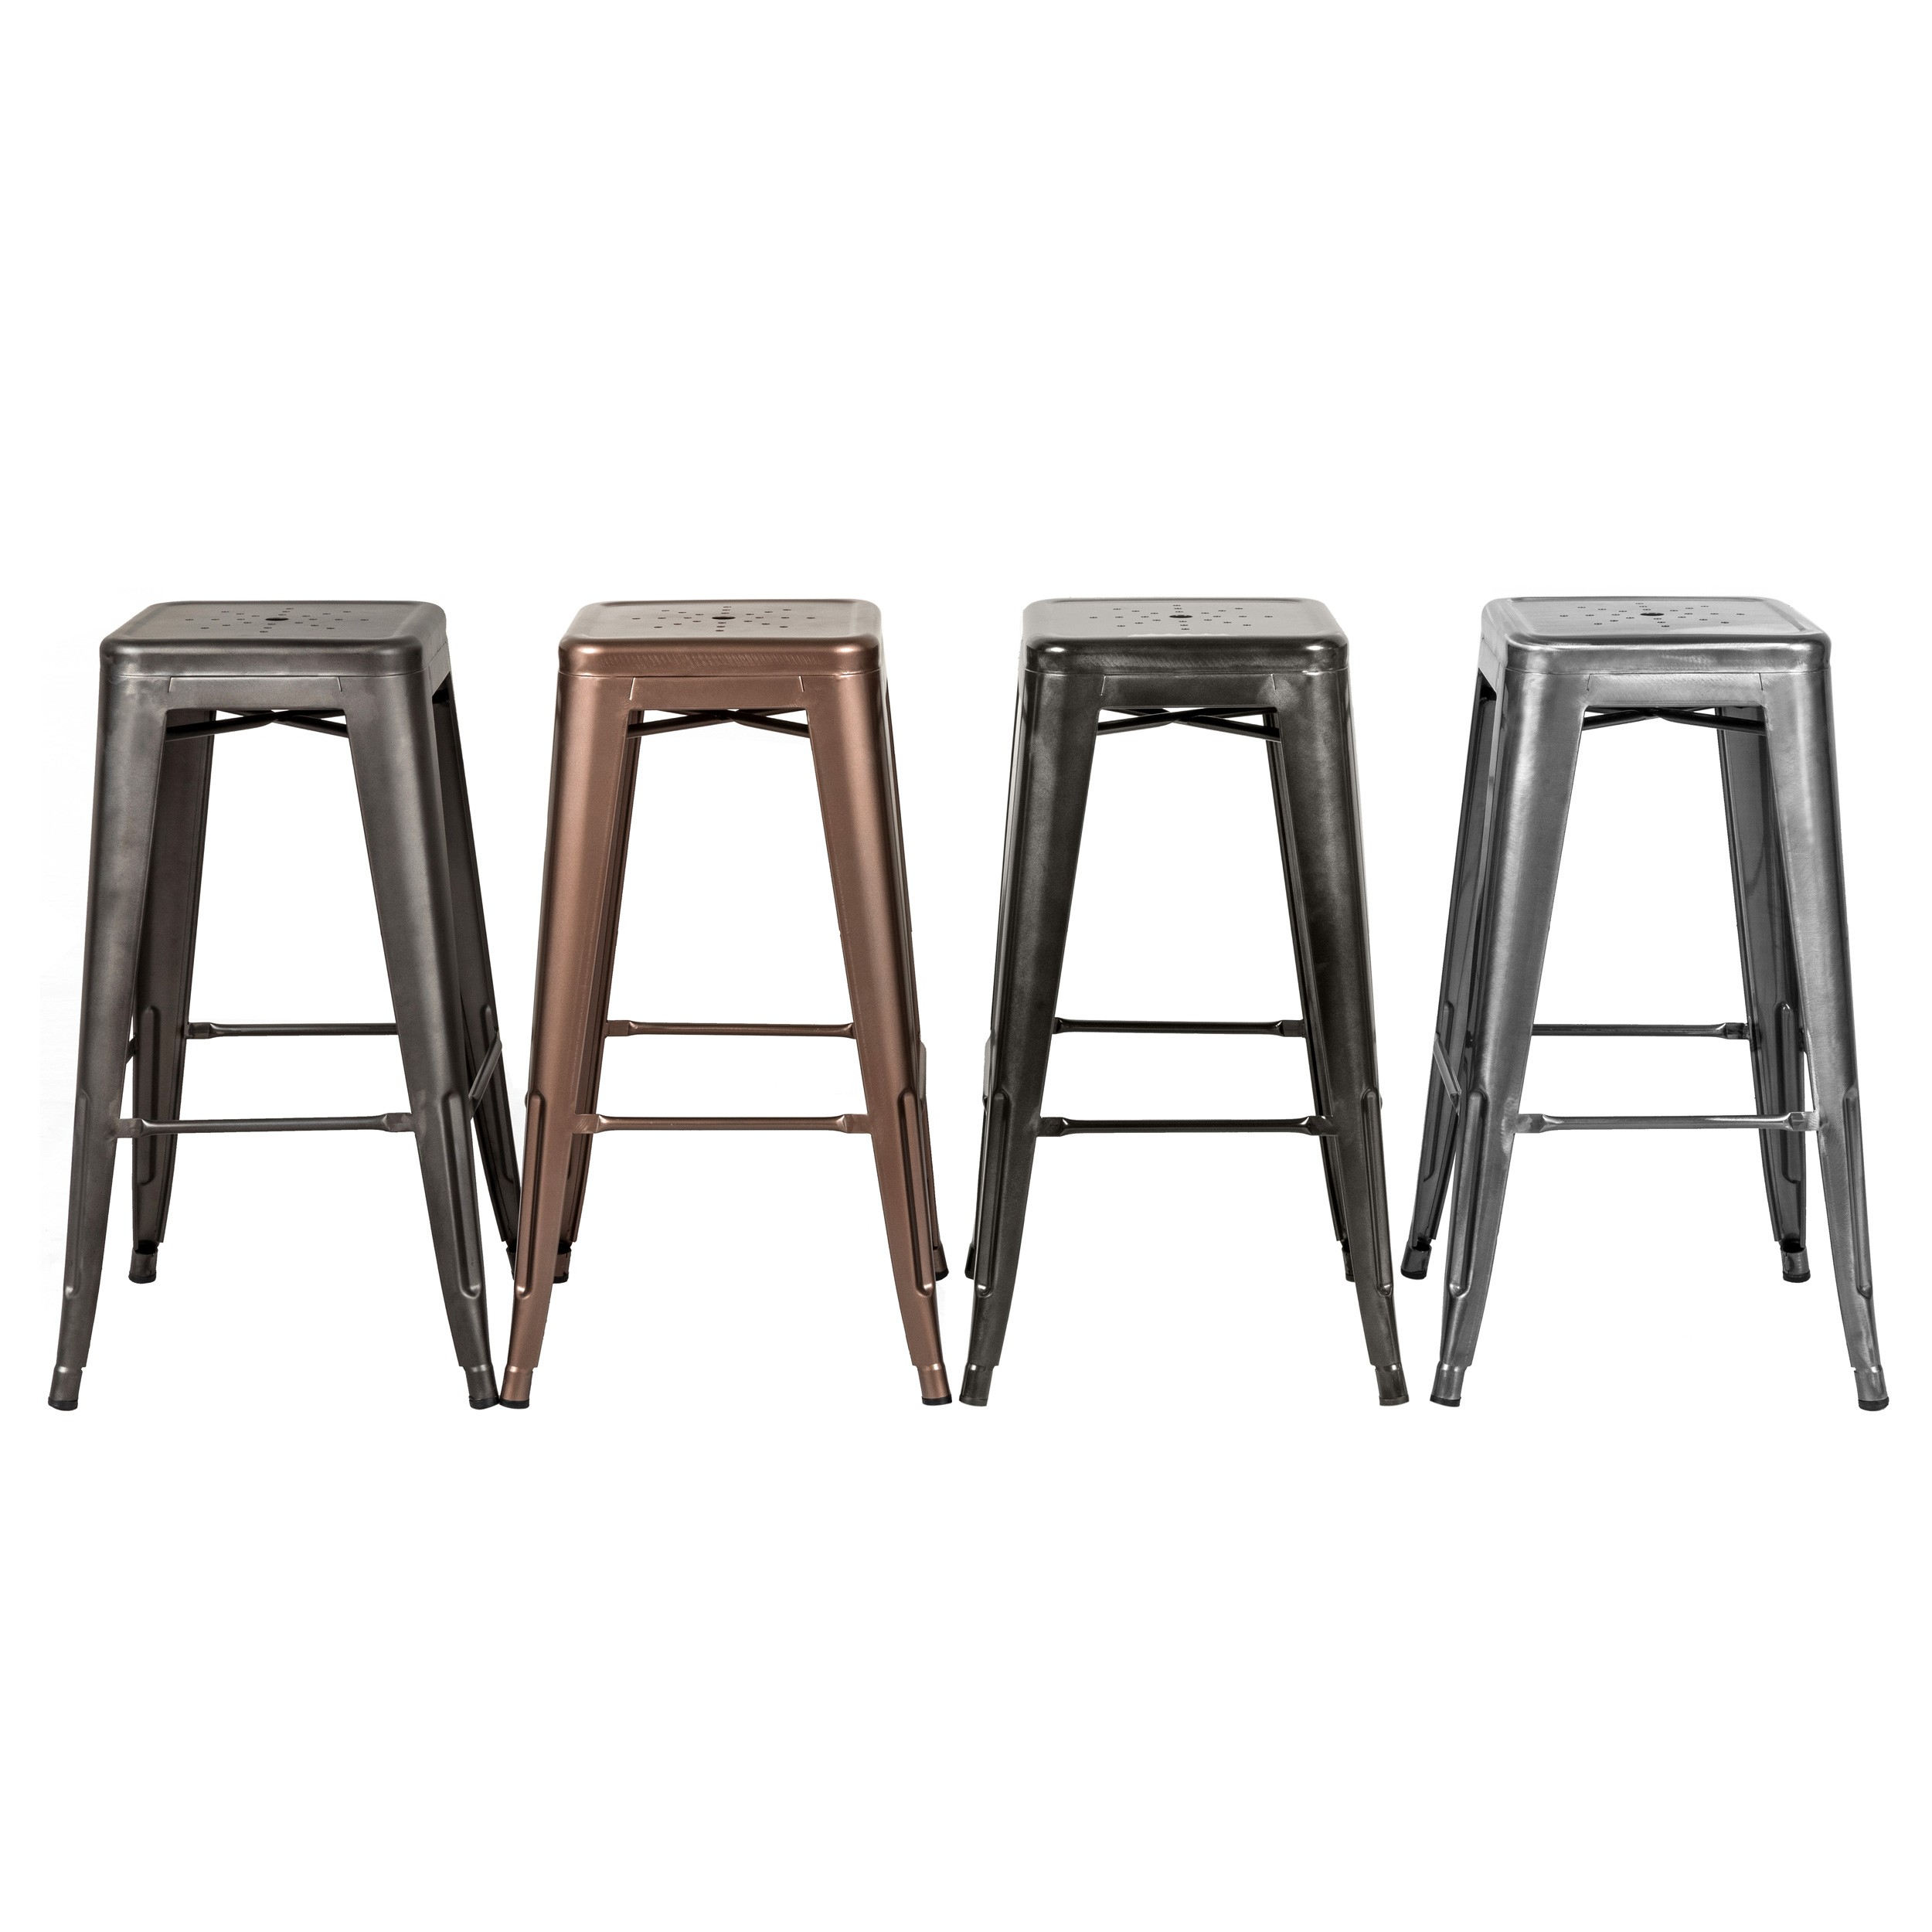 tabouret de bar indus anthracite lot de 2 adoptez les tabourets de bar indus anthracite rdv d co. Black Bedroom Furniture Sets. Home Design Ideas